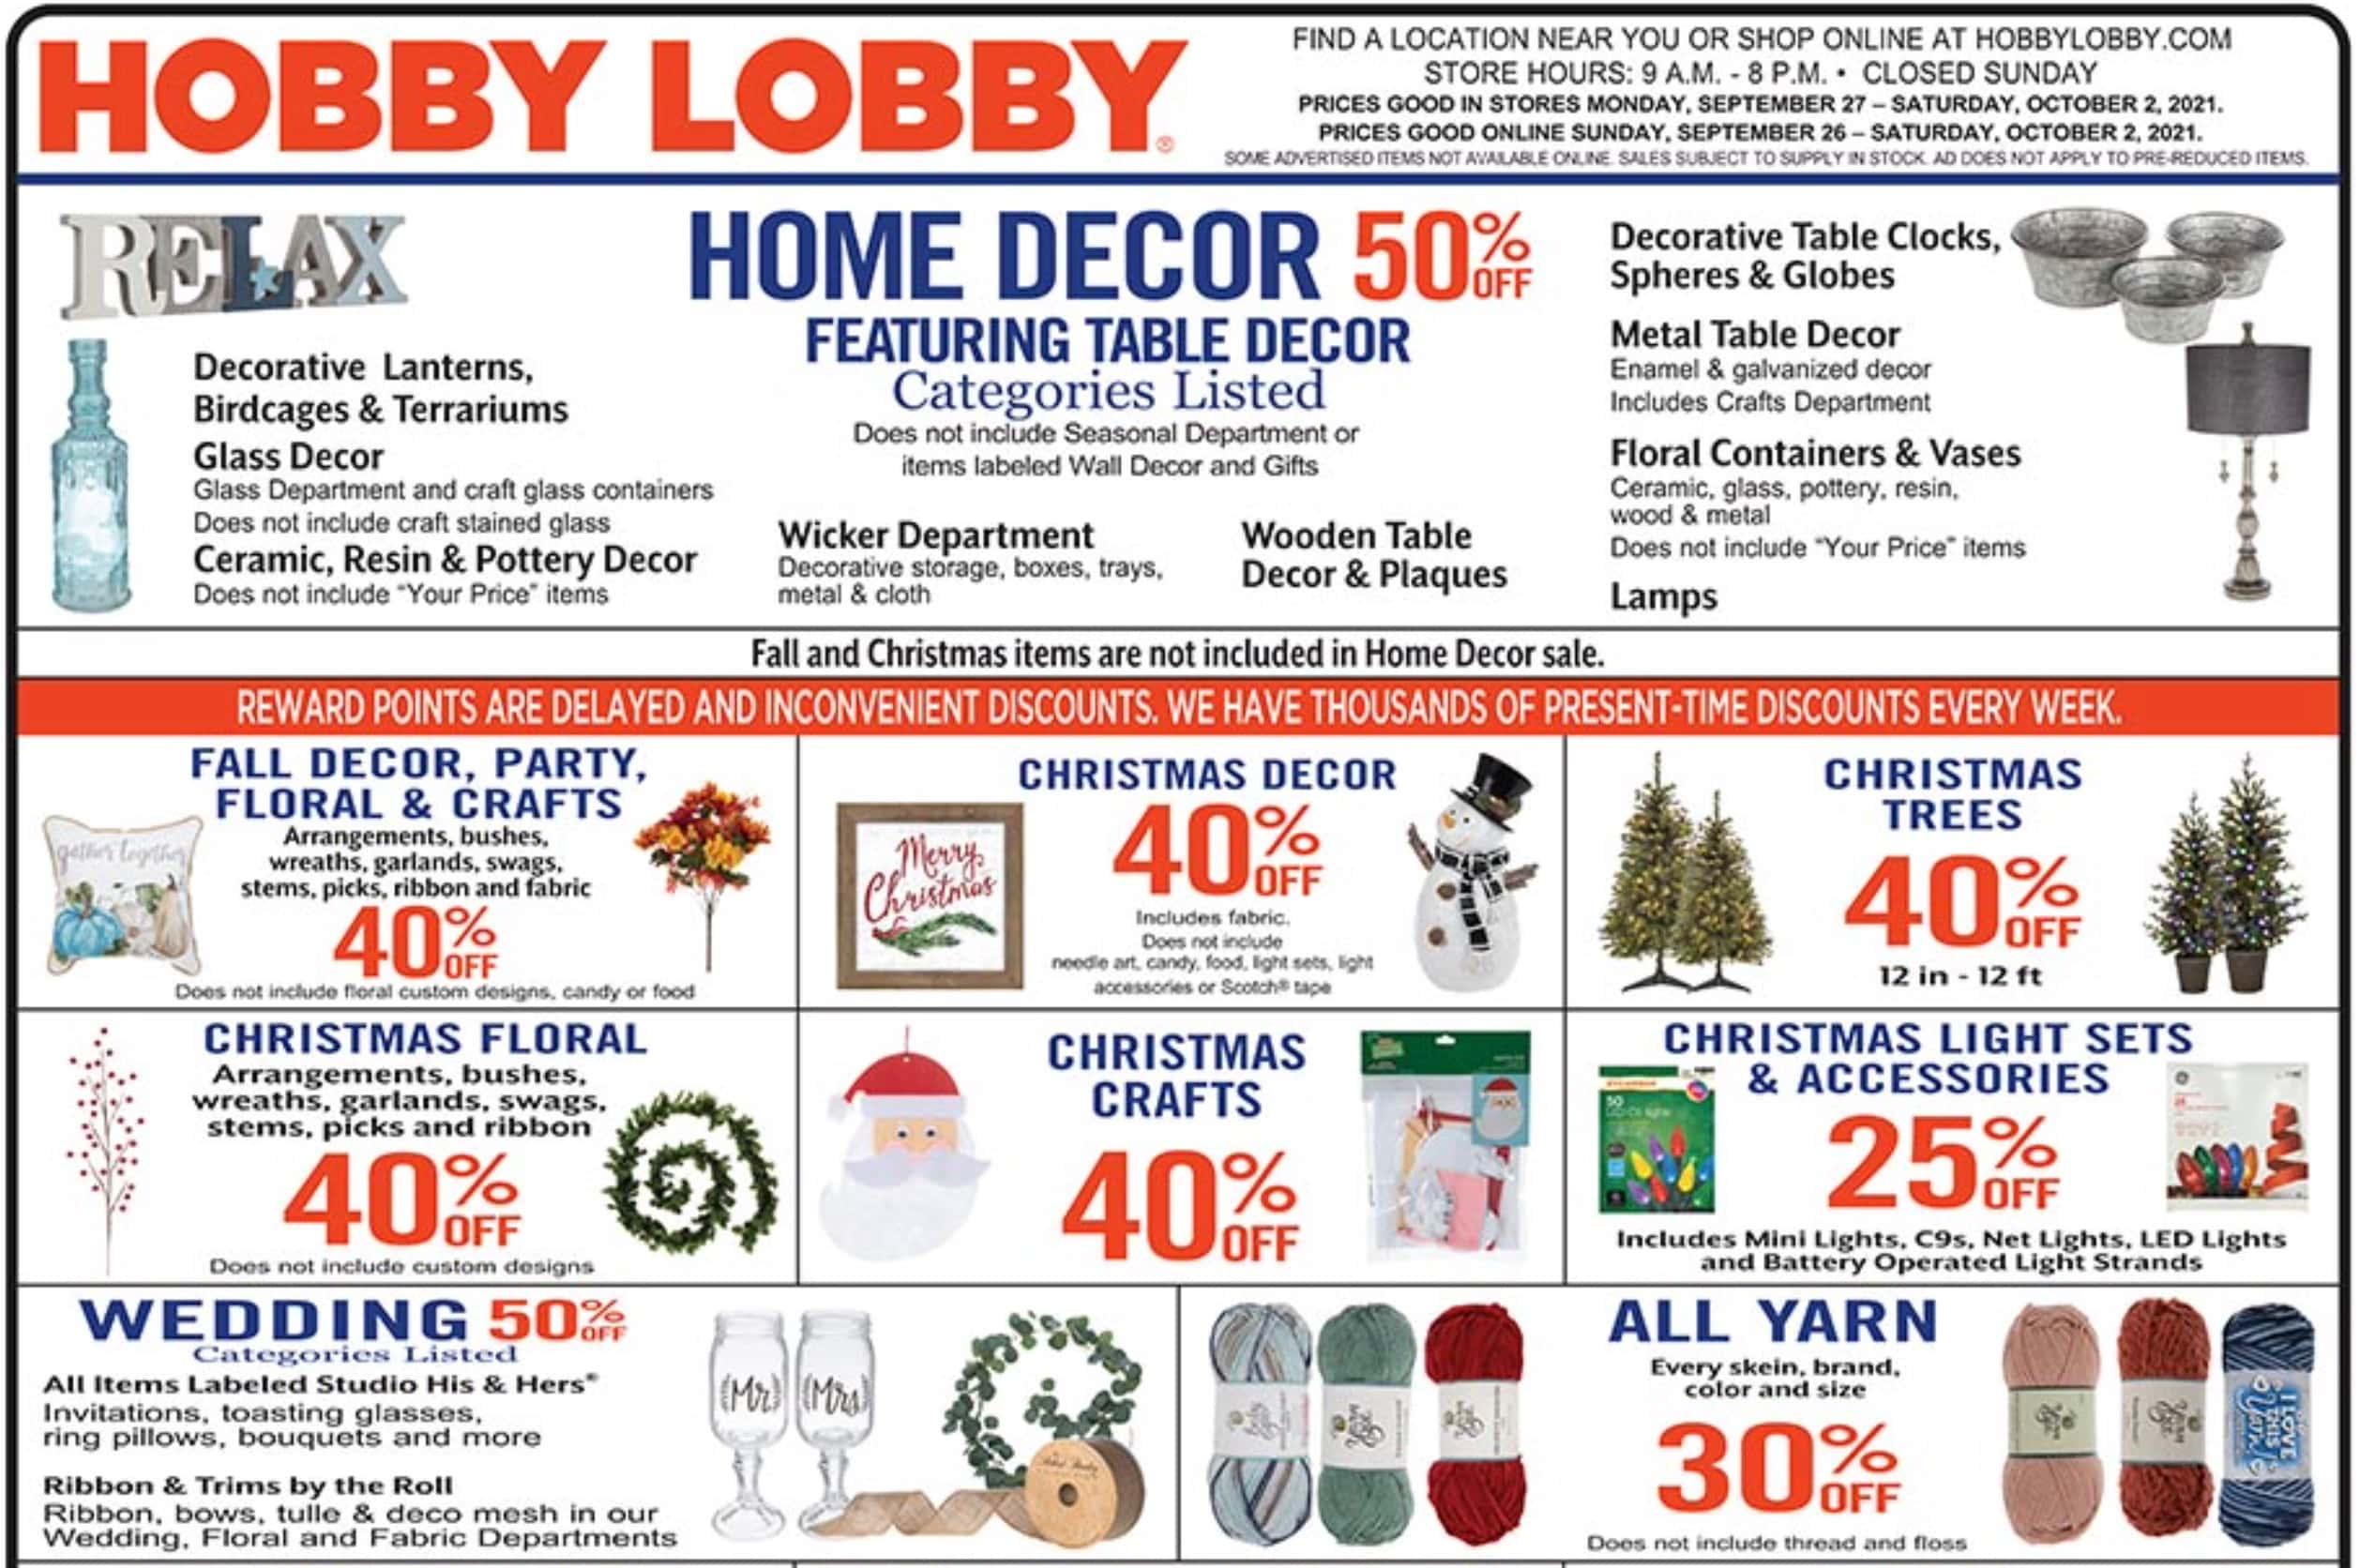 1. Hobby Lobby weekly ad September 26 - October 2, 2021